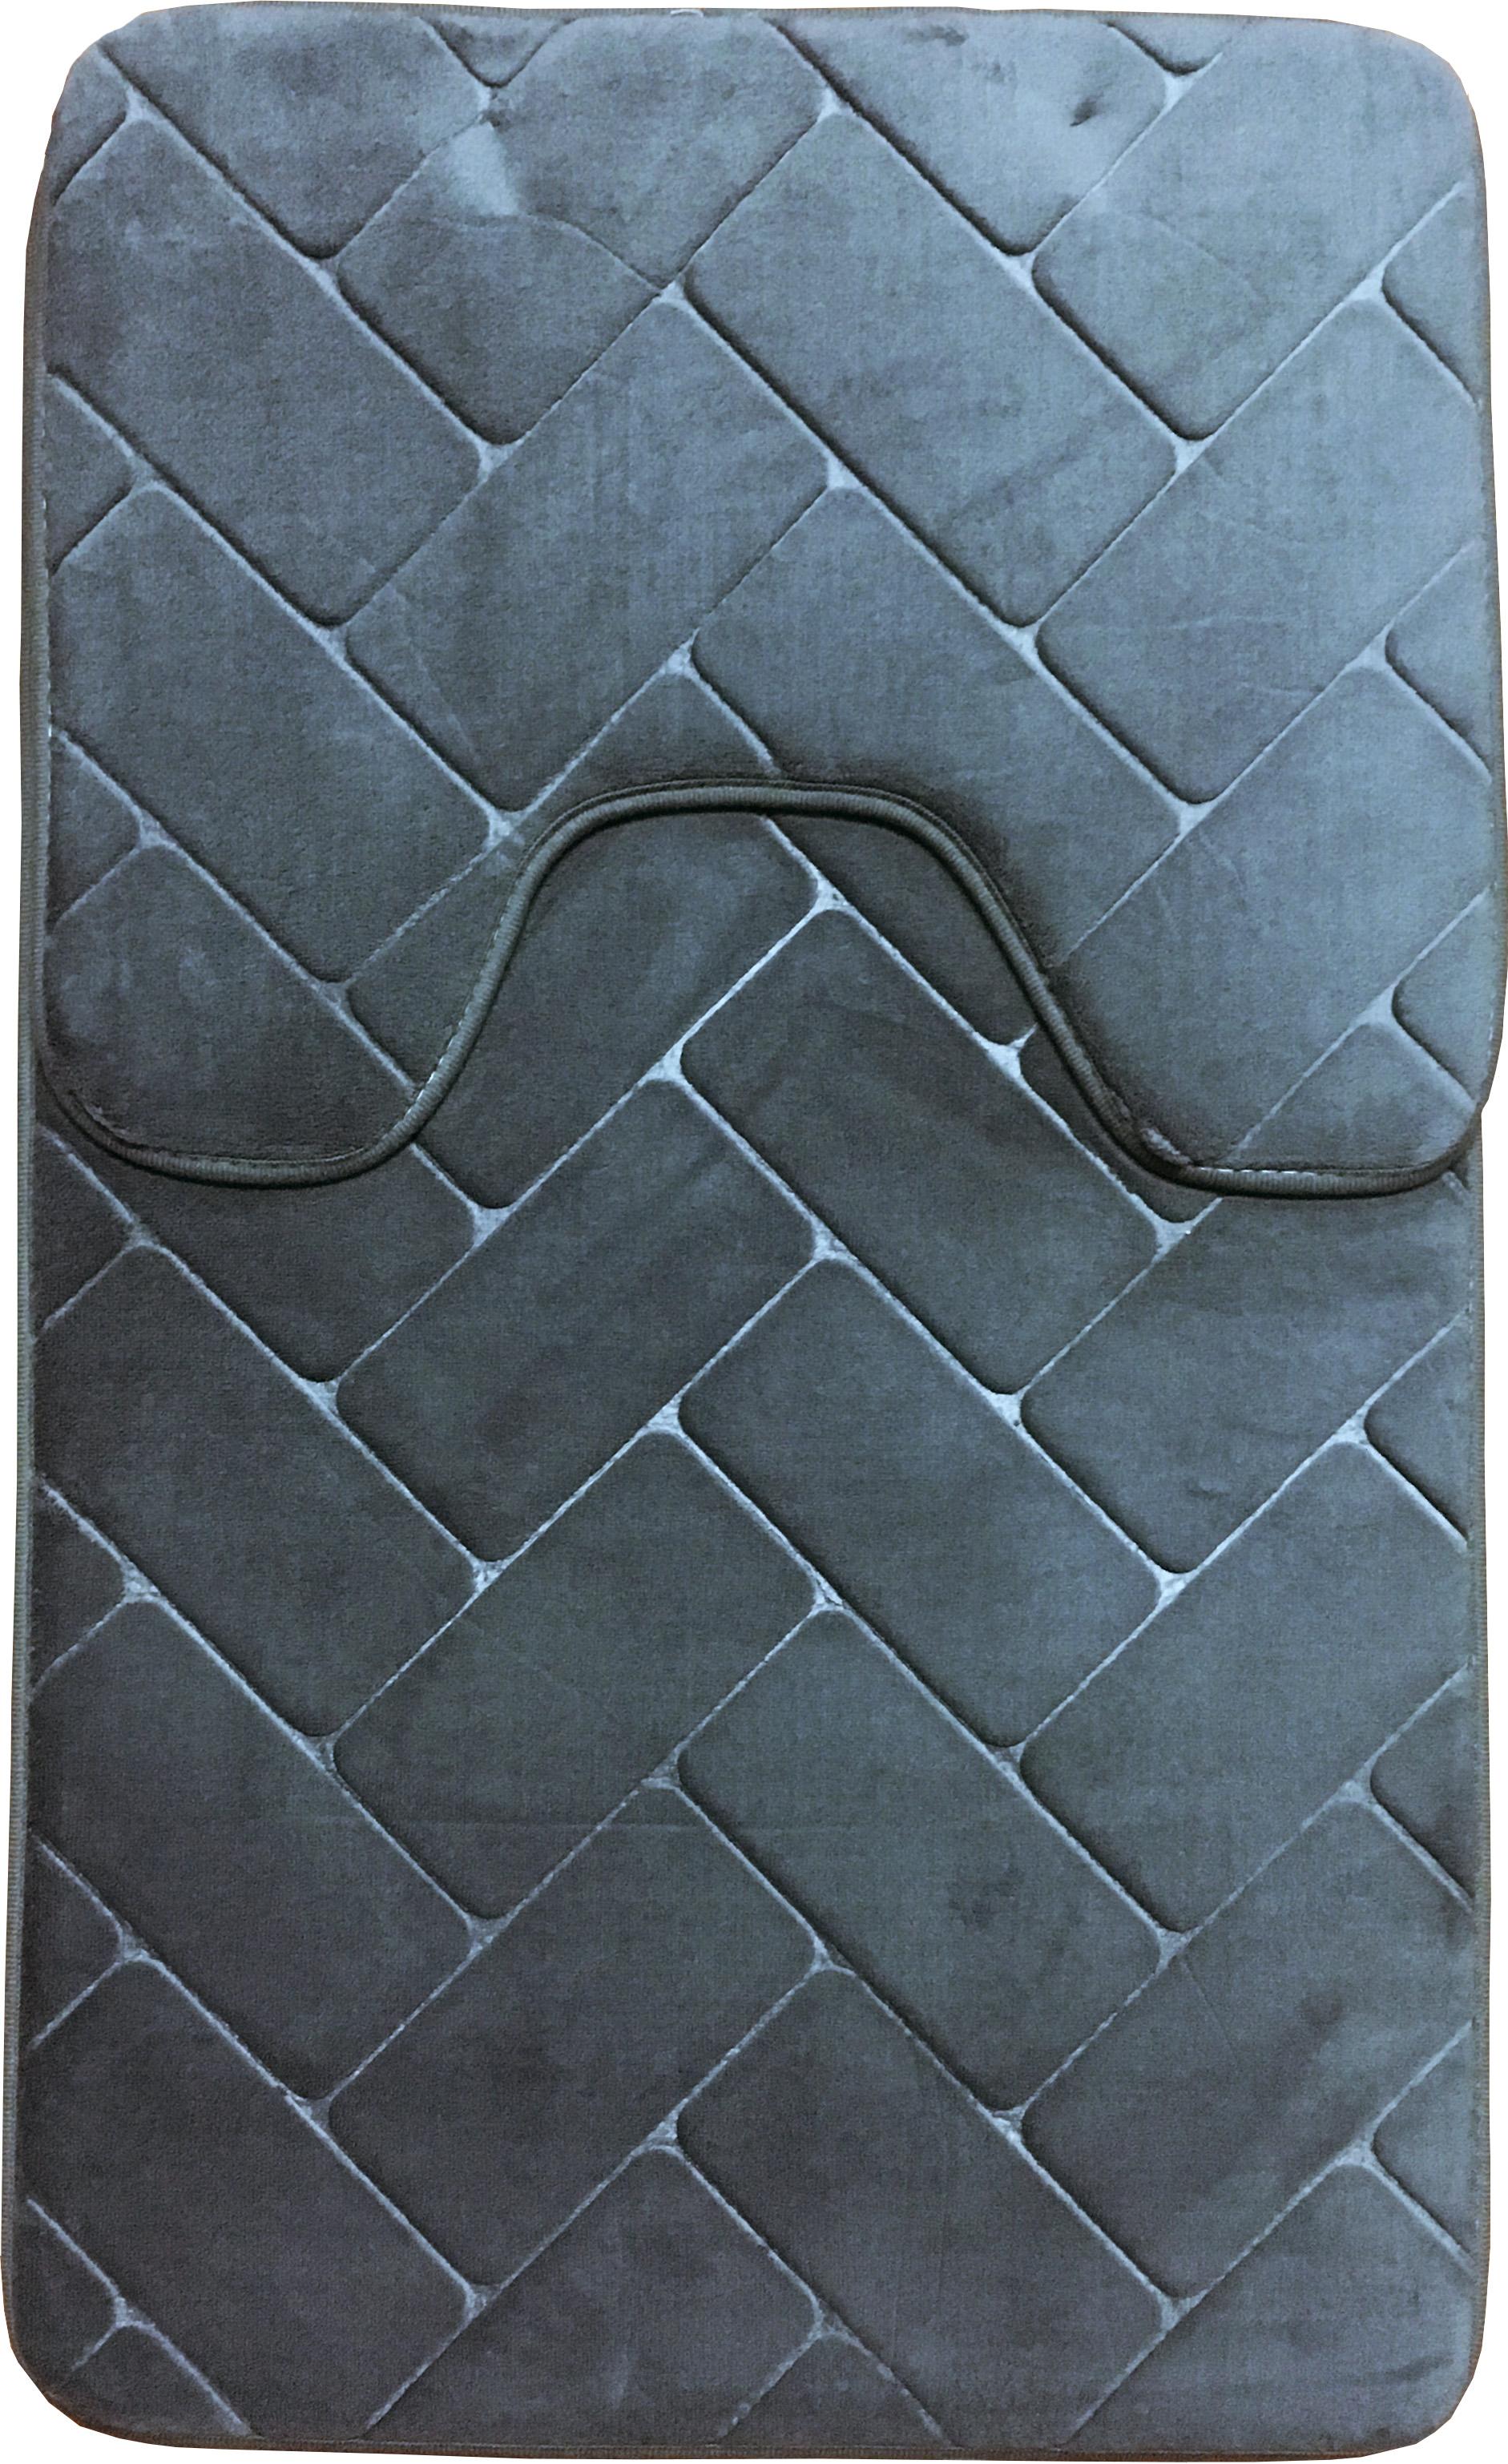 carpet design latest posts under bathroom pin